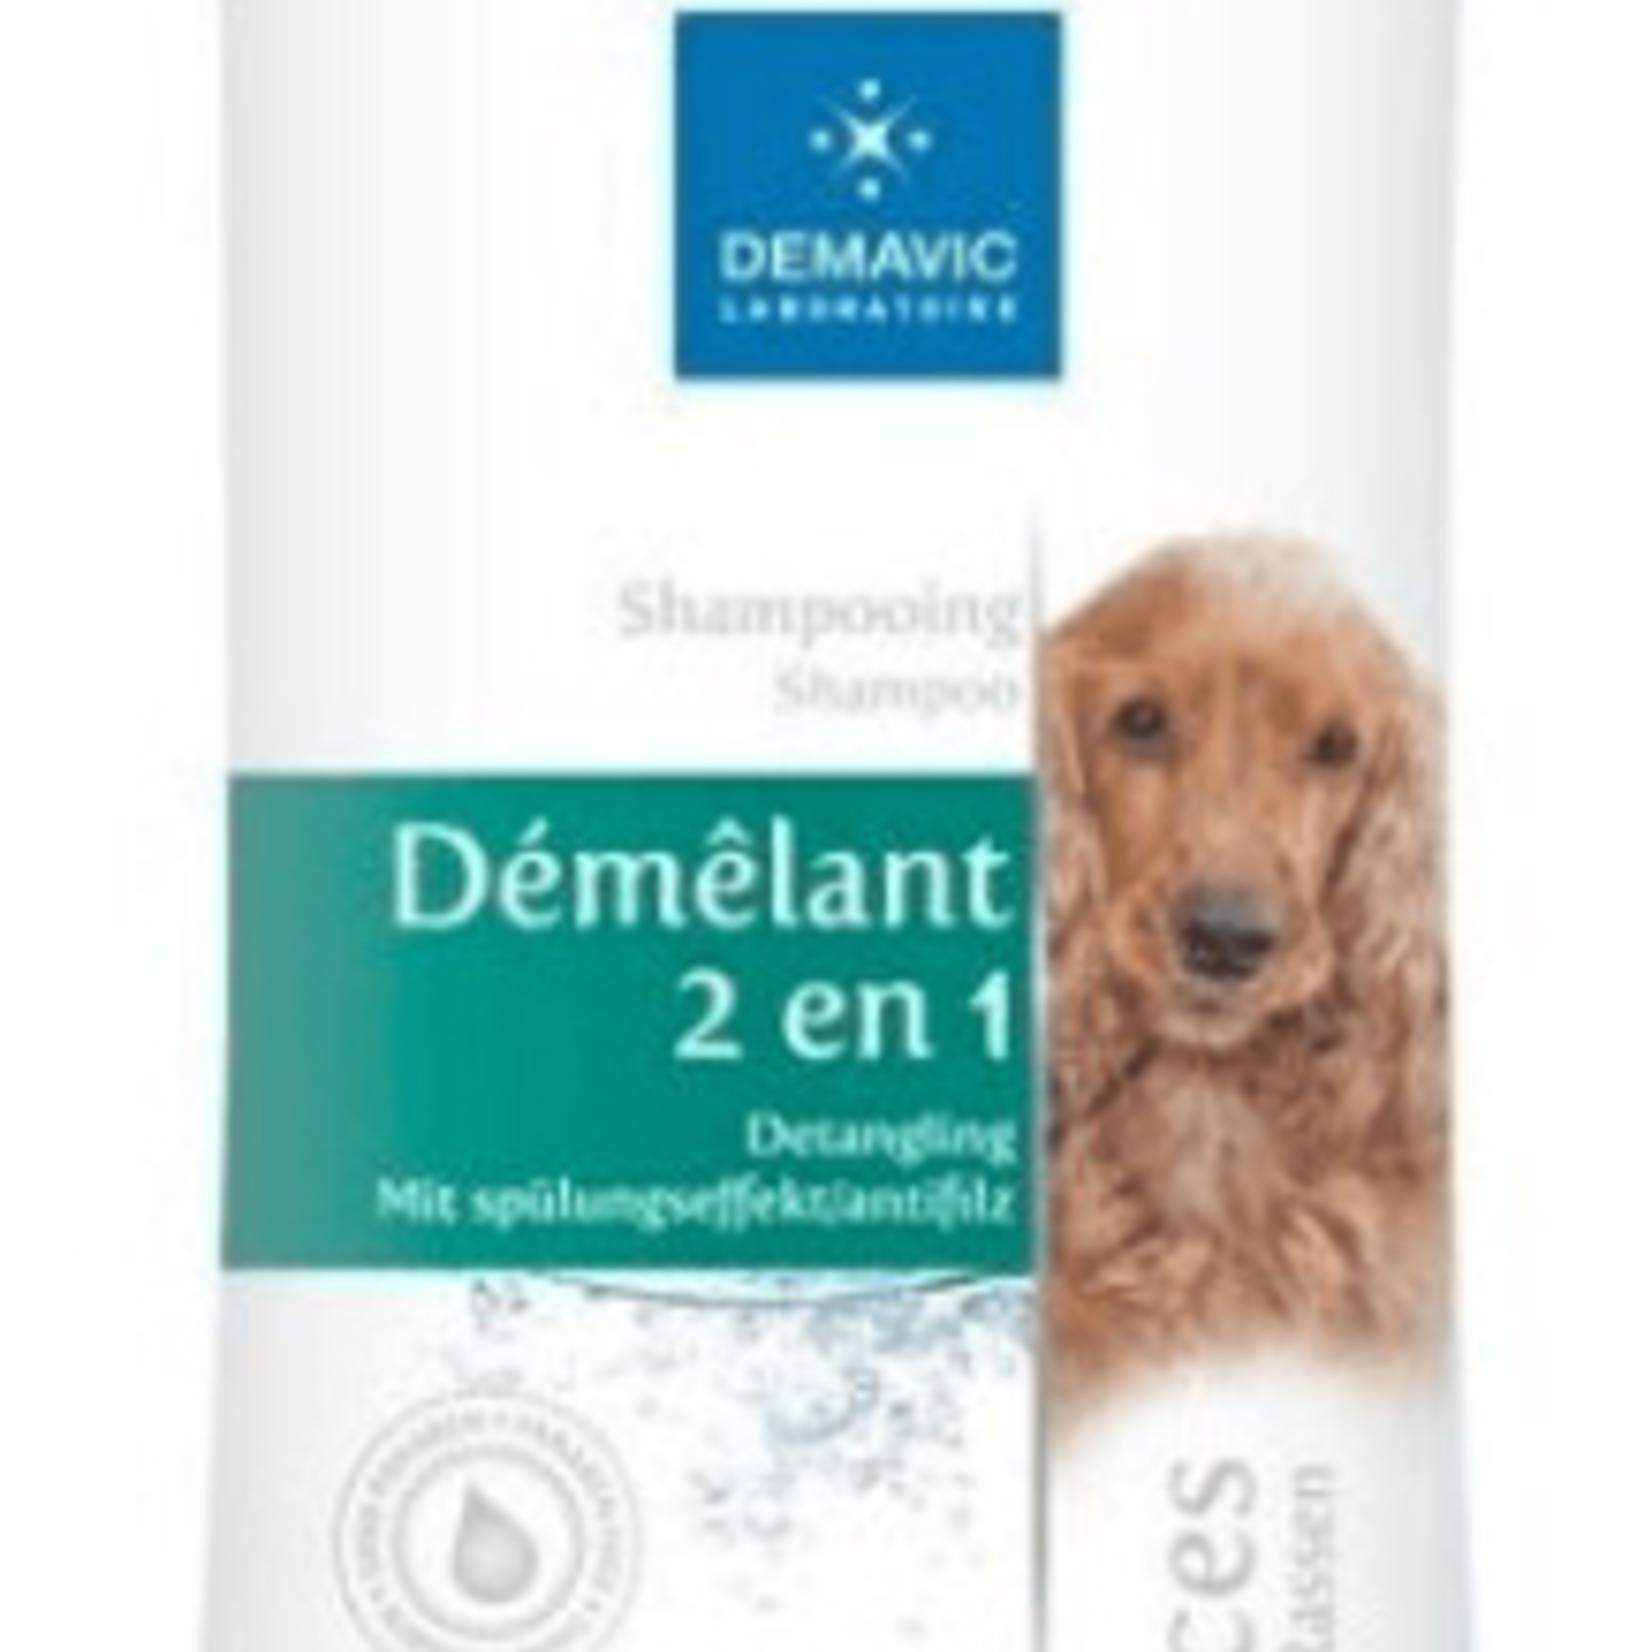 Demavic Shampooing Démêlant 2 en 1-250 ml